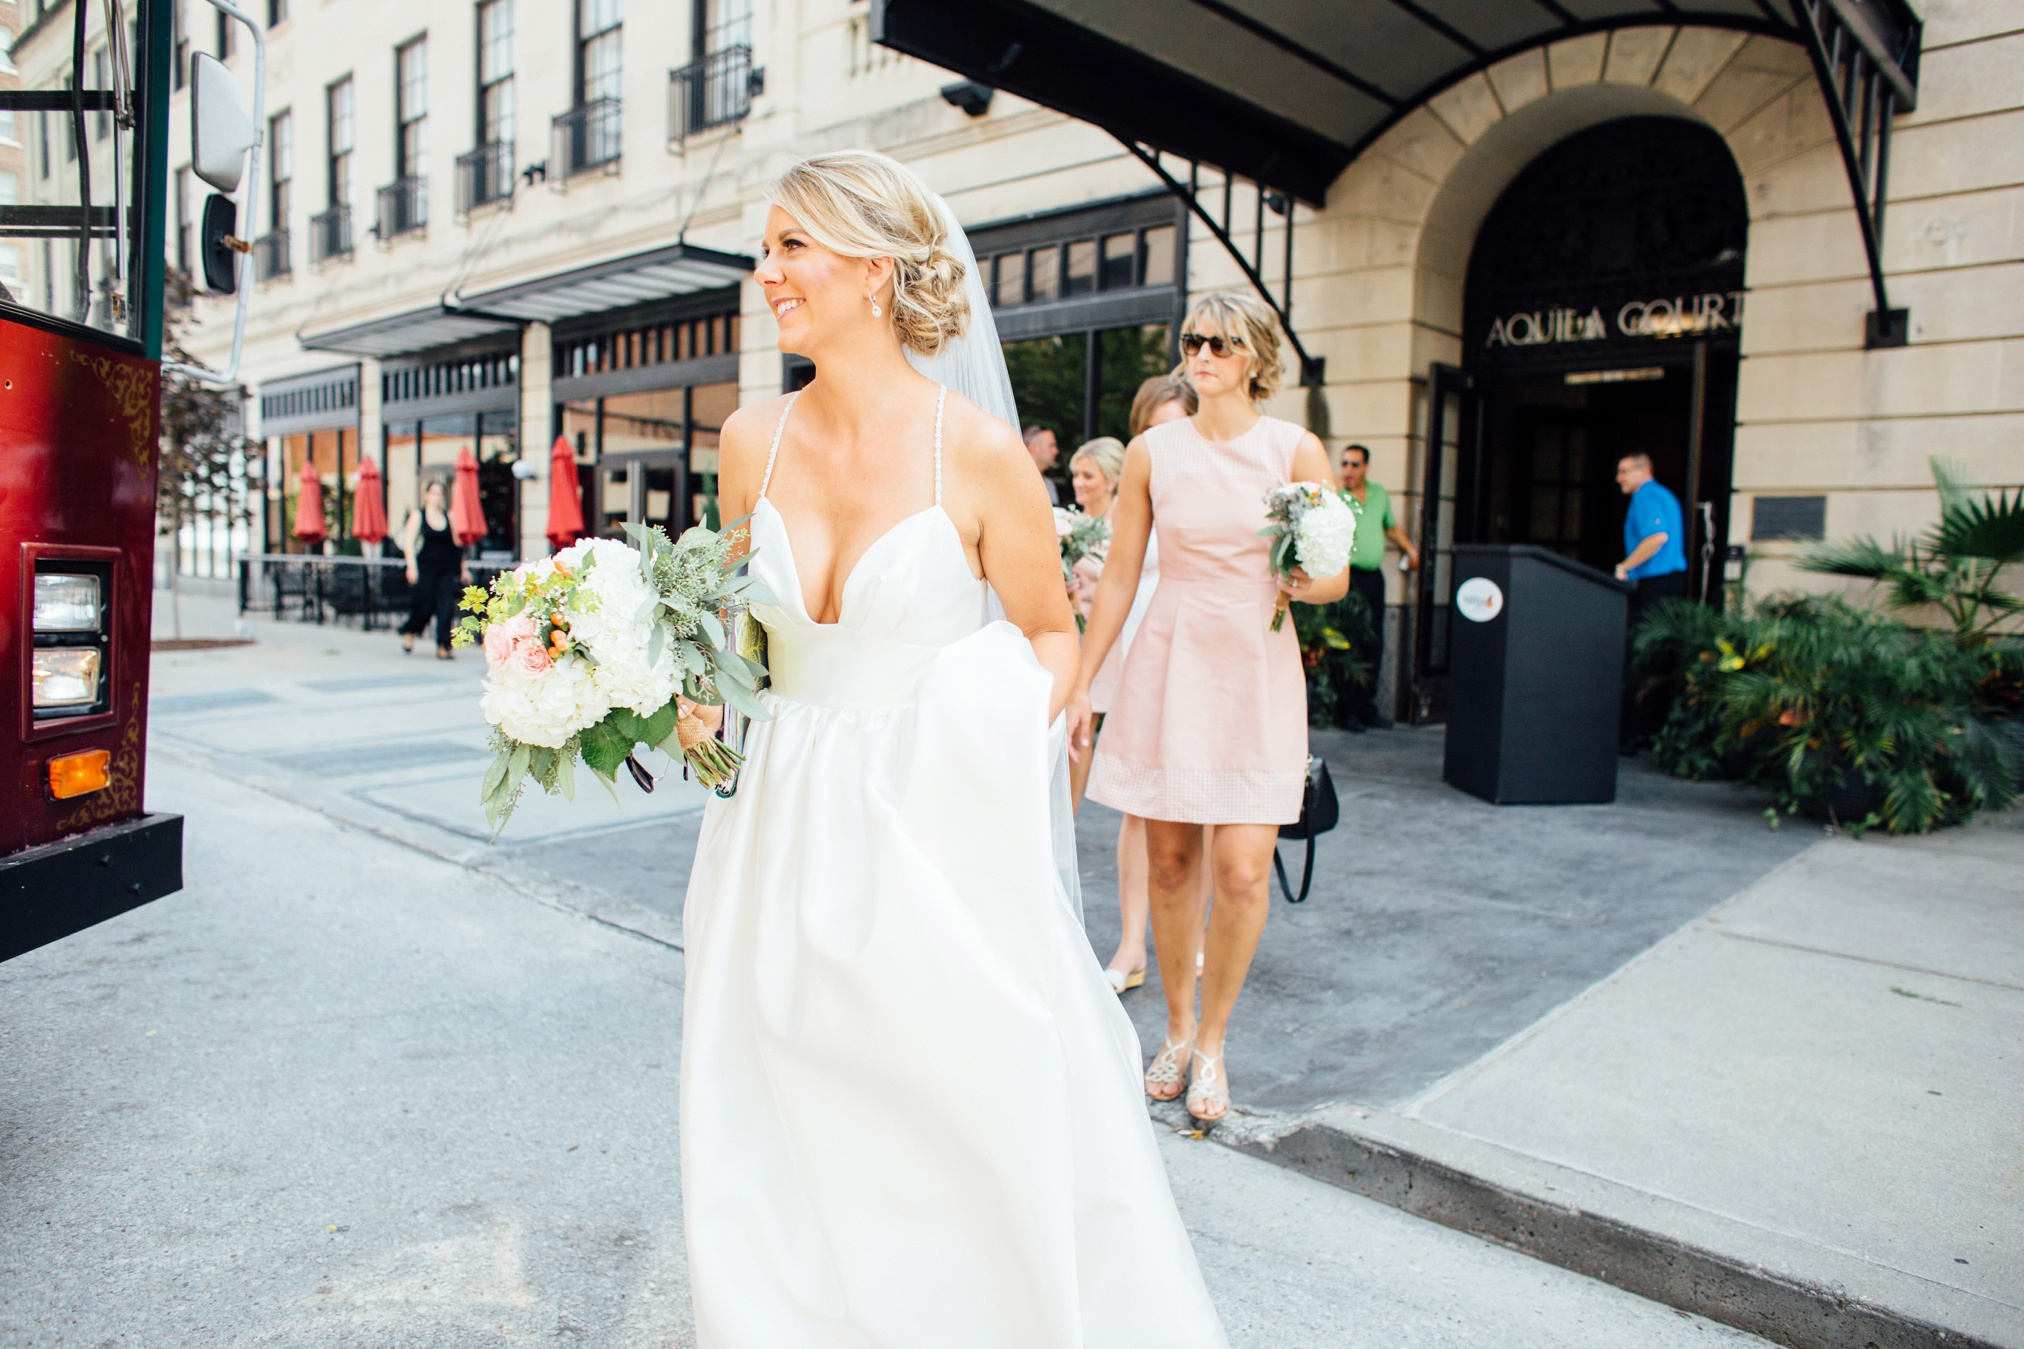 brenna+michael_wedding-232.jpg